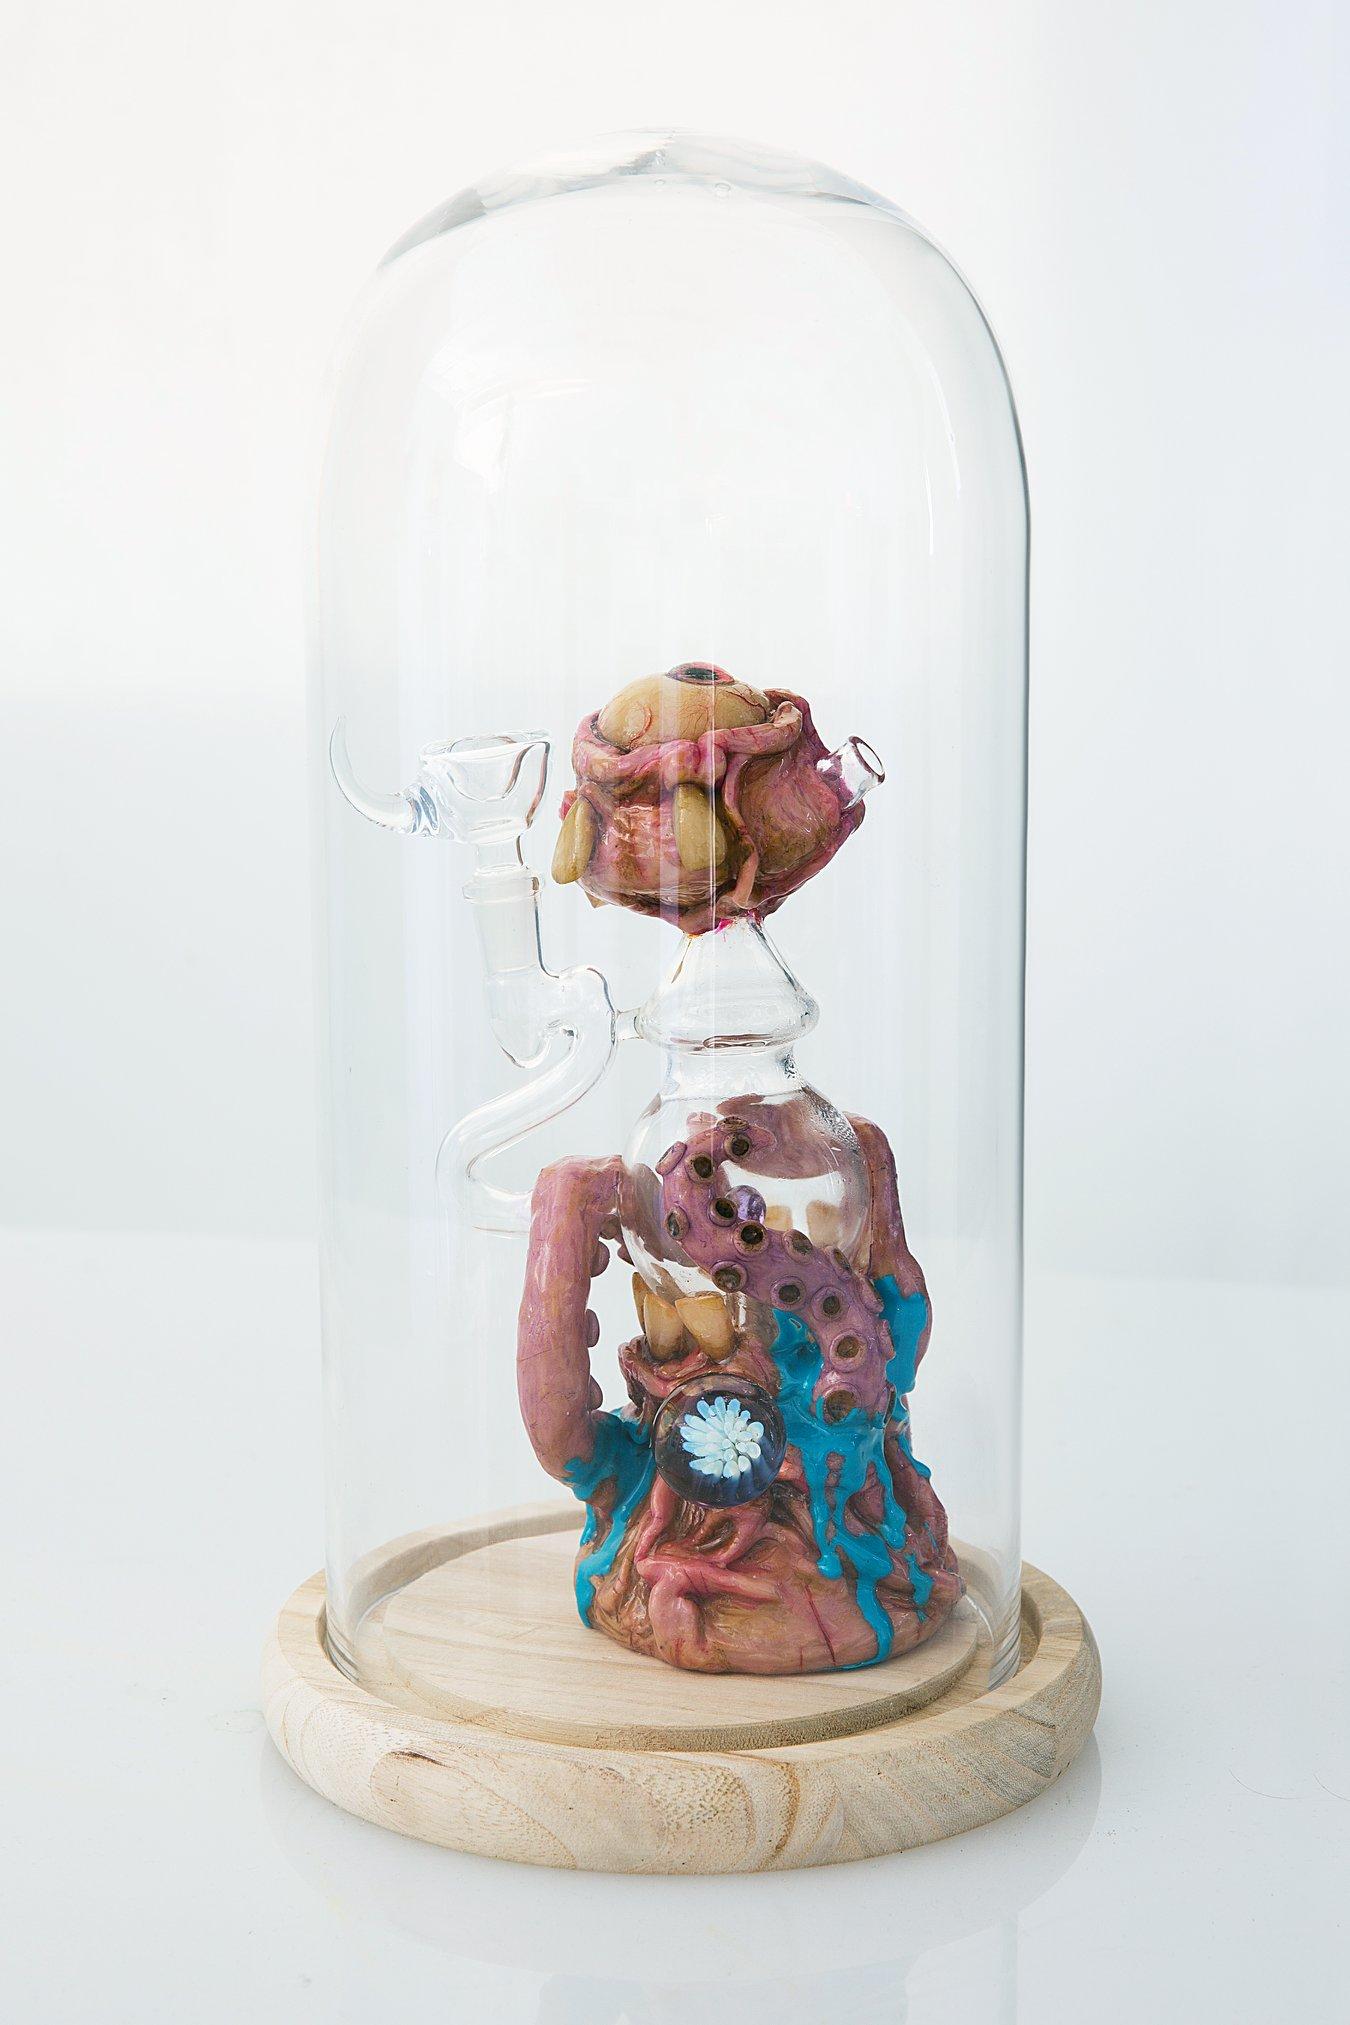 "Dr. Whitestone X Moldy Creations - ""Eld Fen"" Insta: @dr.whitestone_glass For Sale: $800"